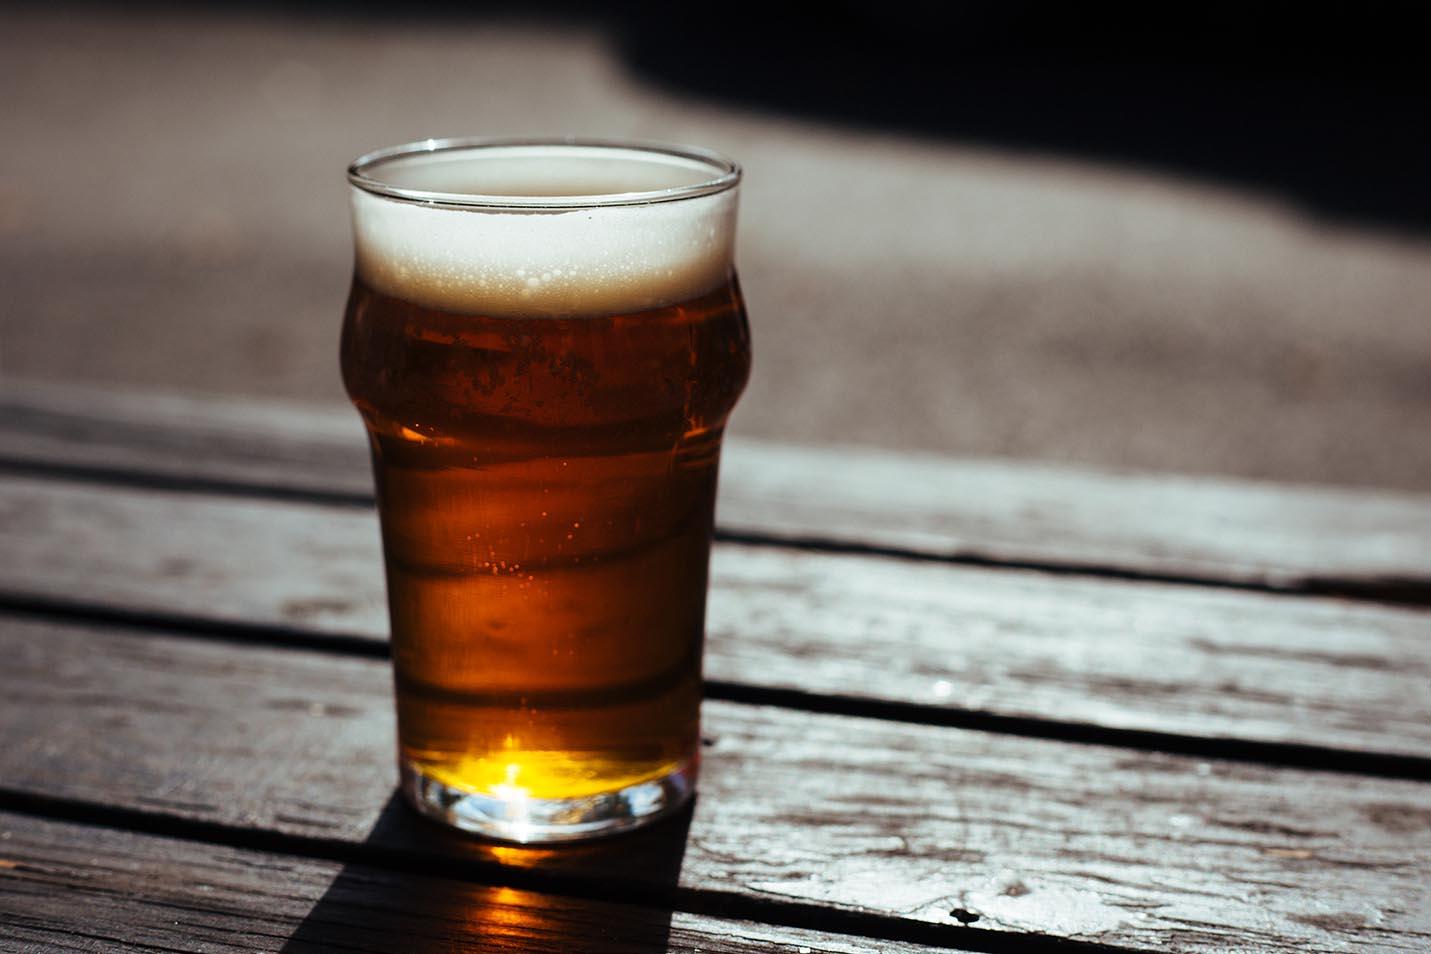 ¿Calidad o mediocridad? La importancia de evaluar técnicamente una cerveza artesana antes de venderla